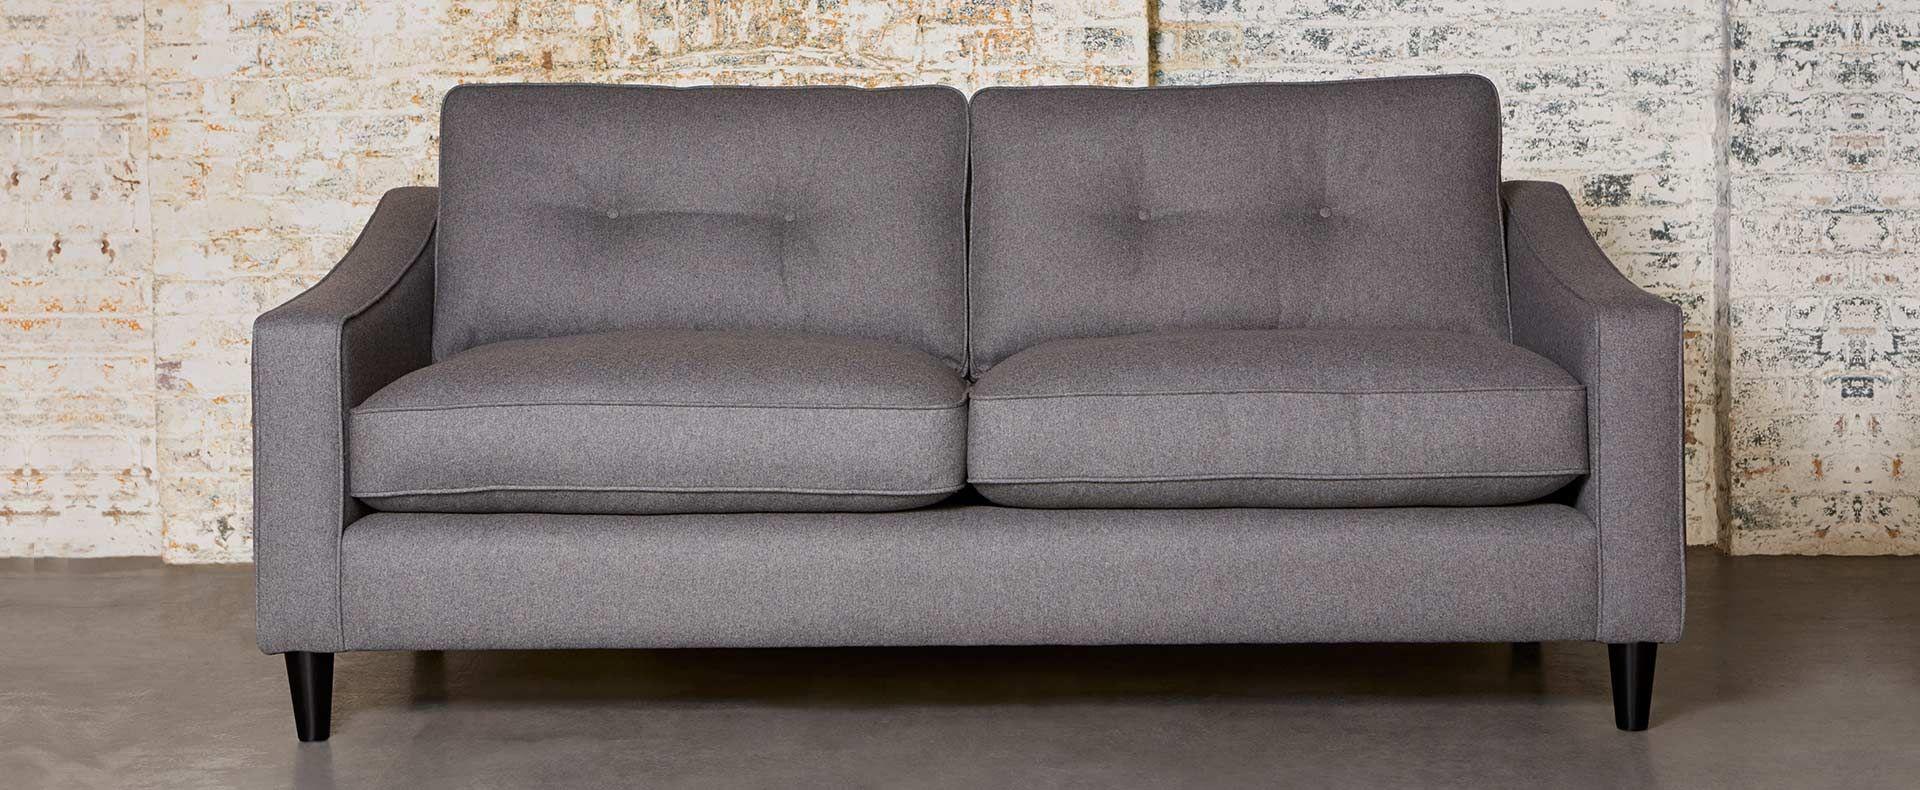 Can T Wait Paddington Extra Large Sofa